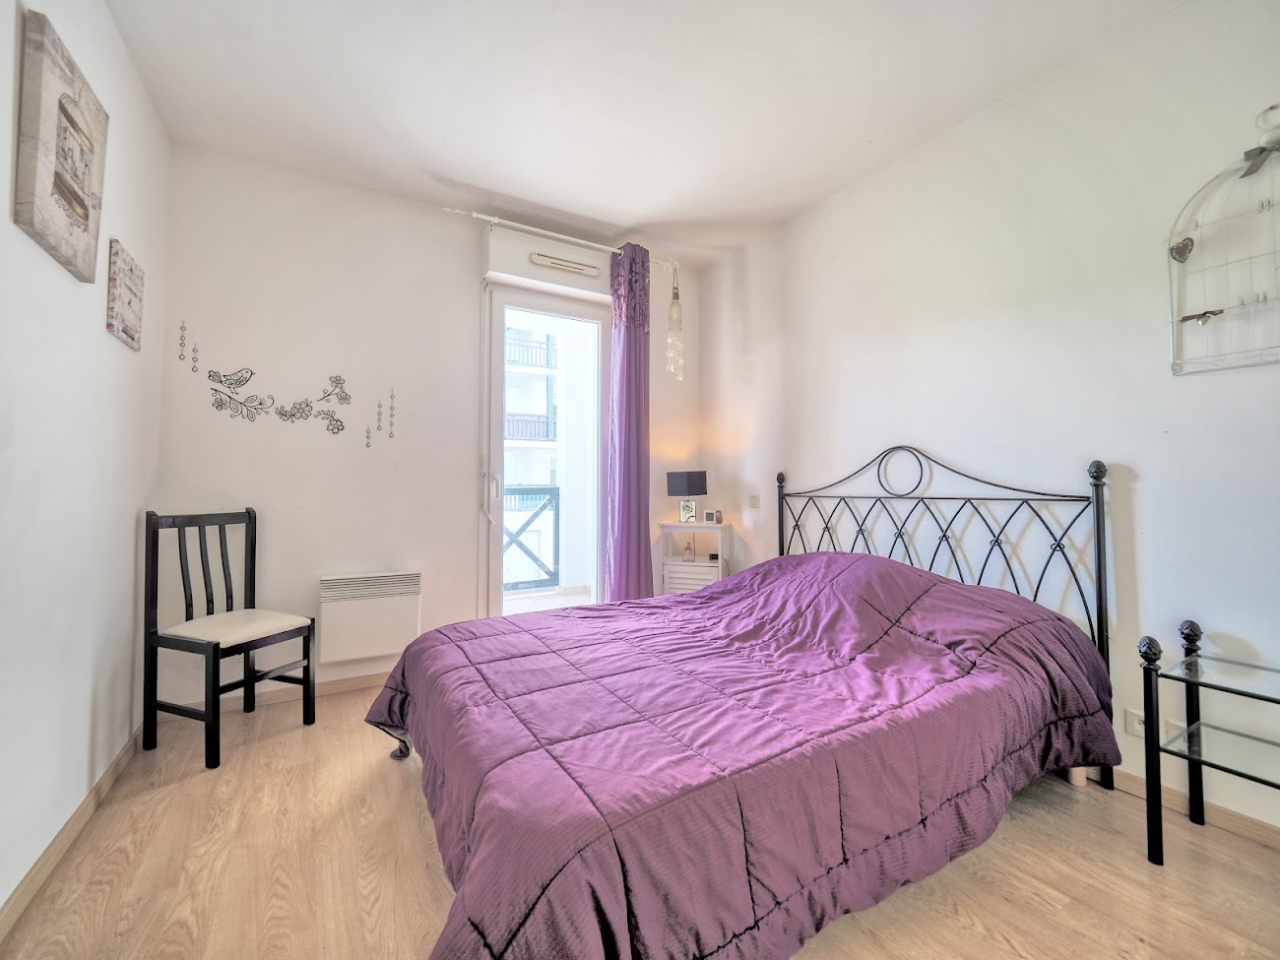 Vente appartement T2  à HENDAYE - 4